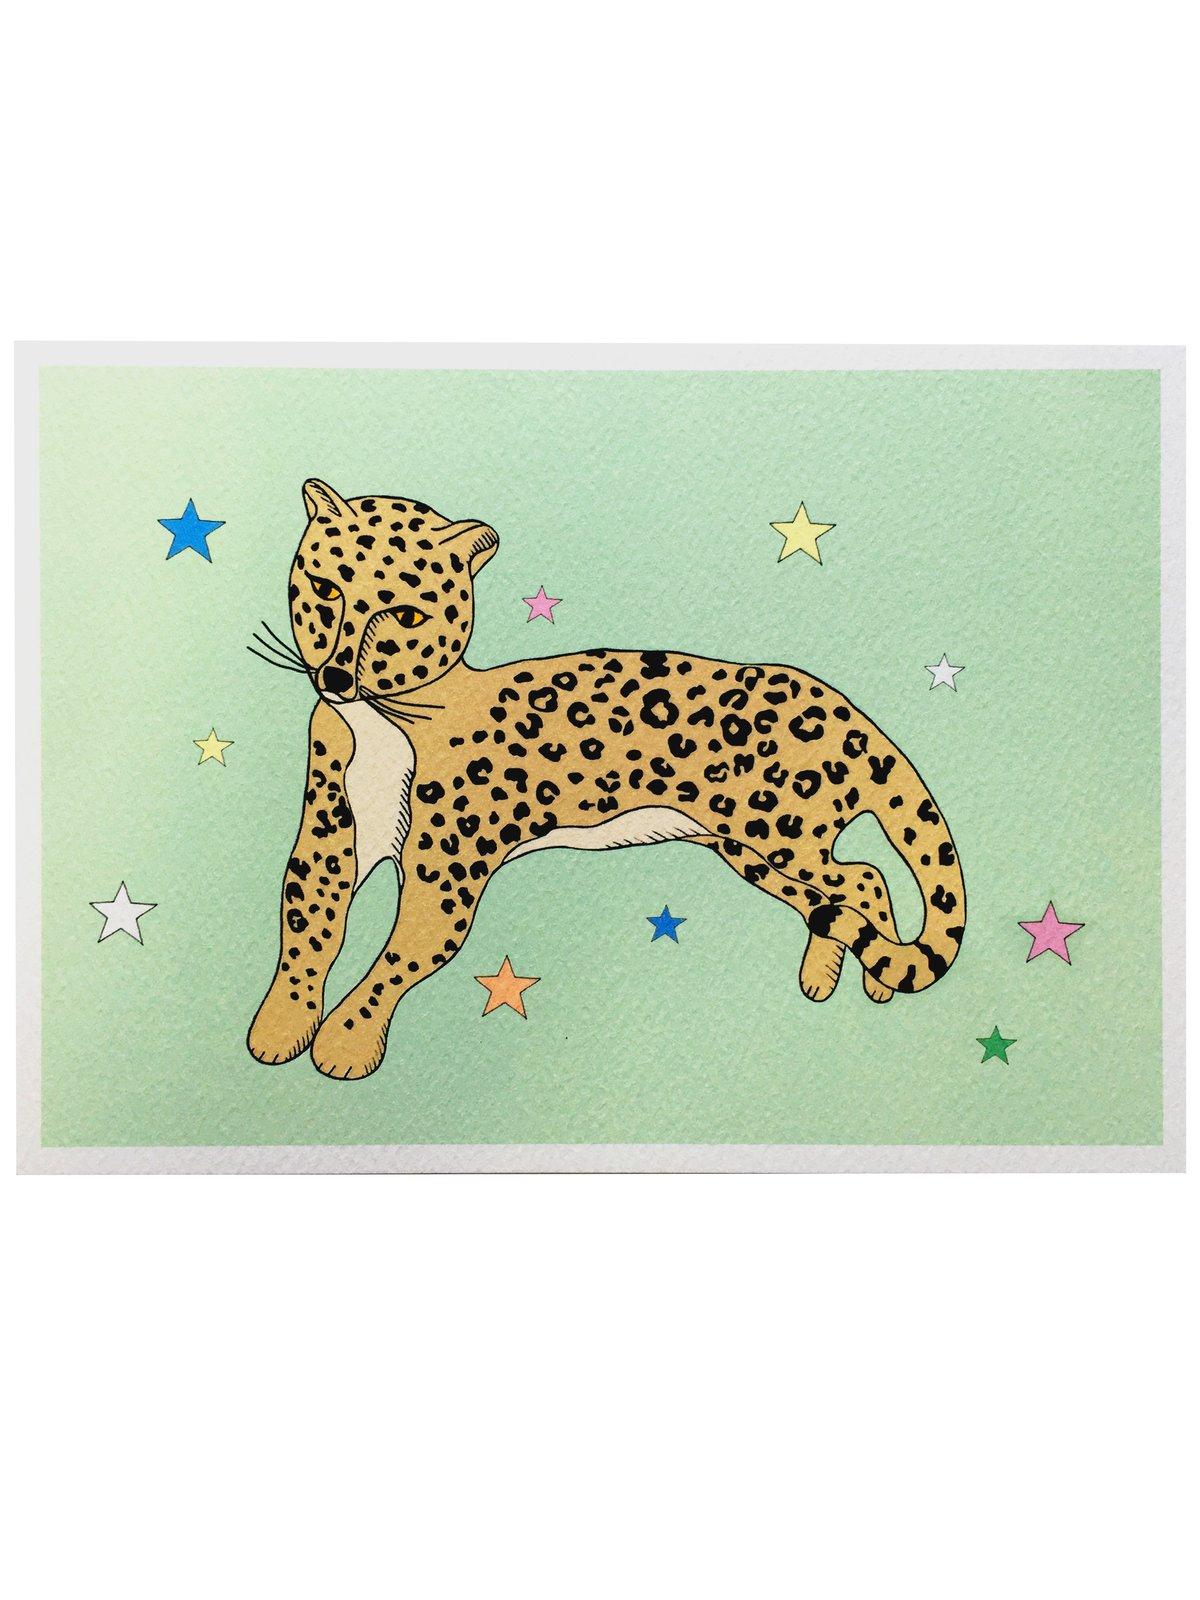 Reclining Leopard A5 Print